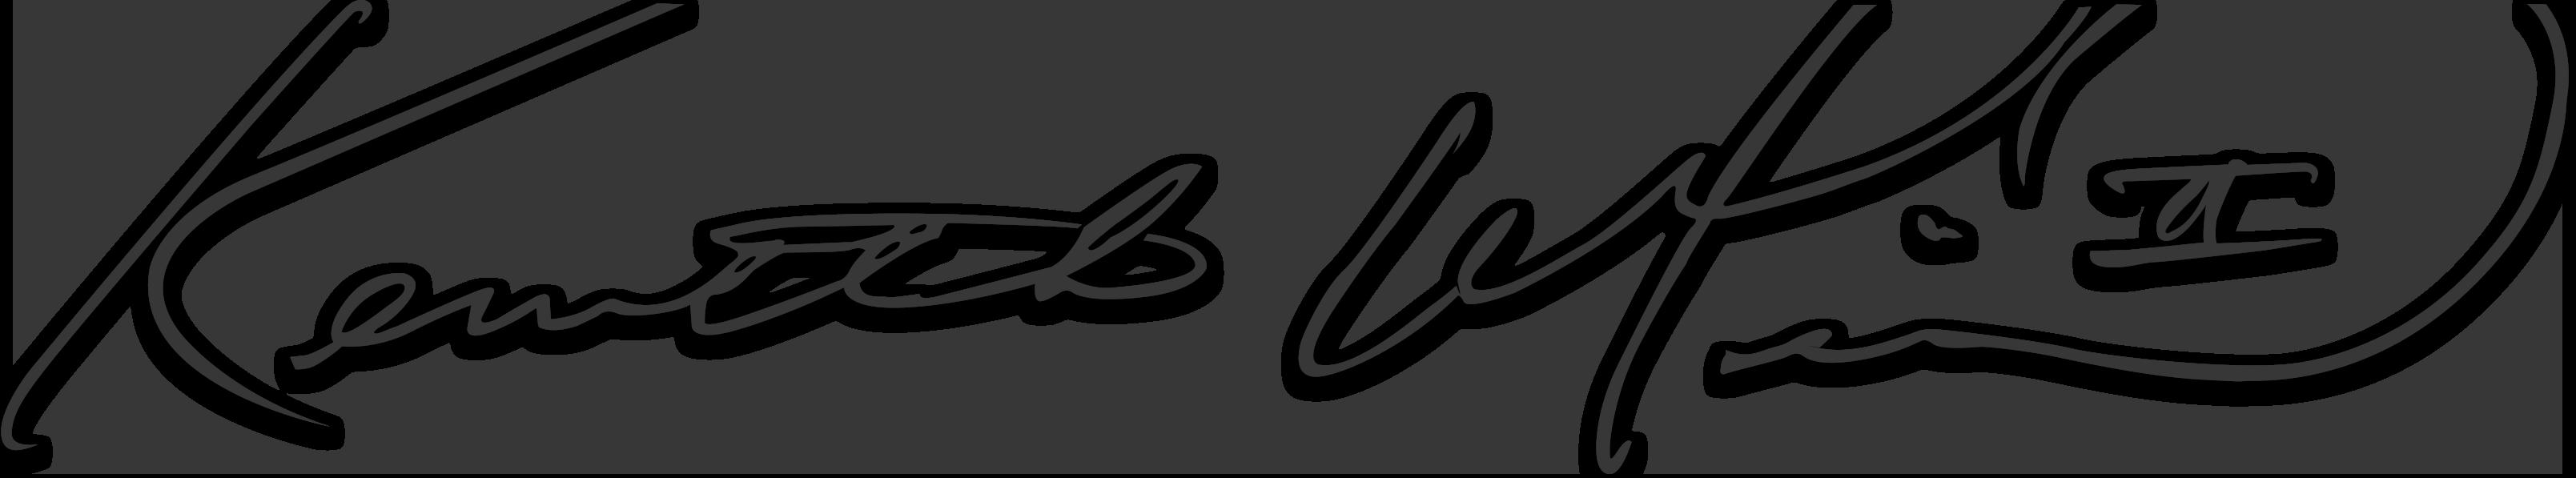 Kenneth Laird Studios Logo